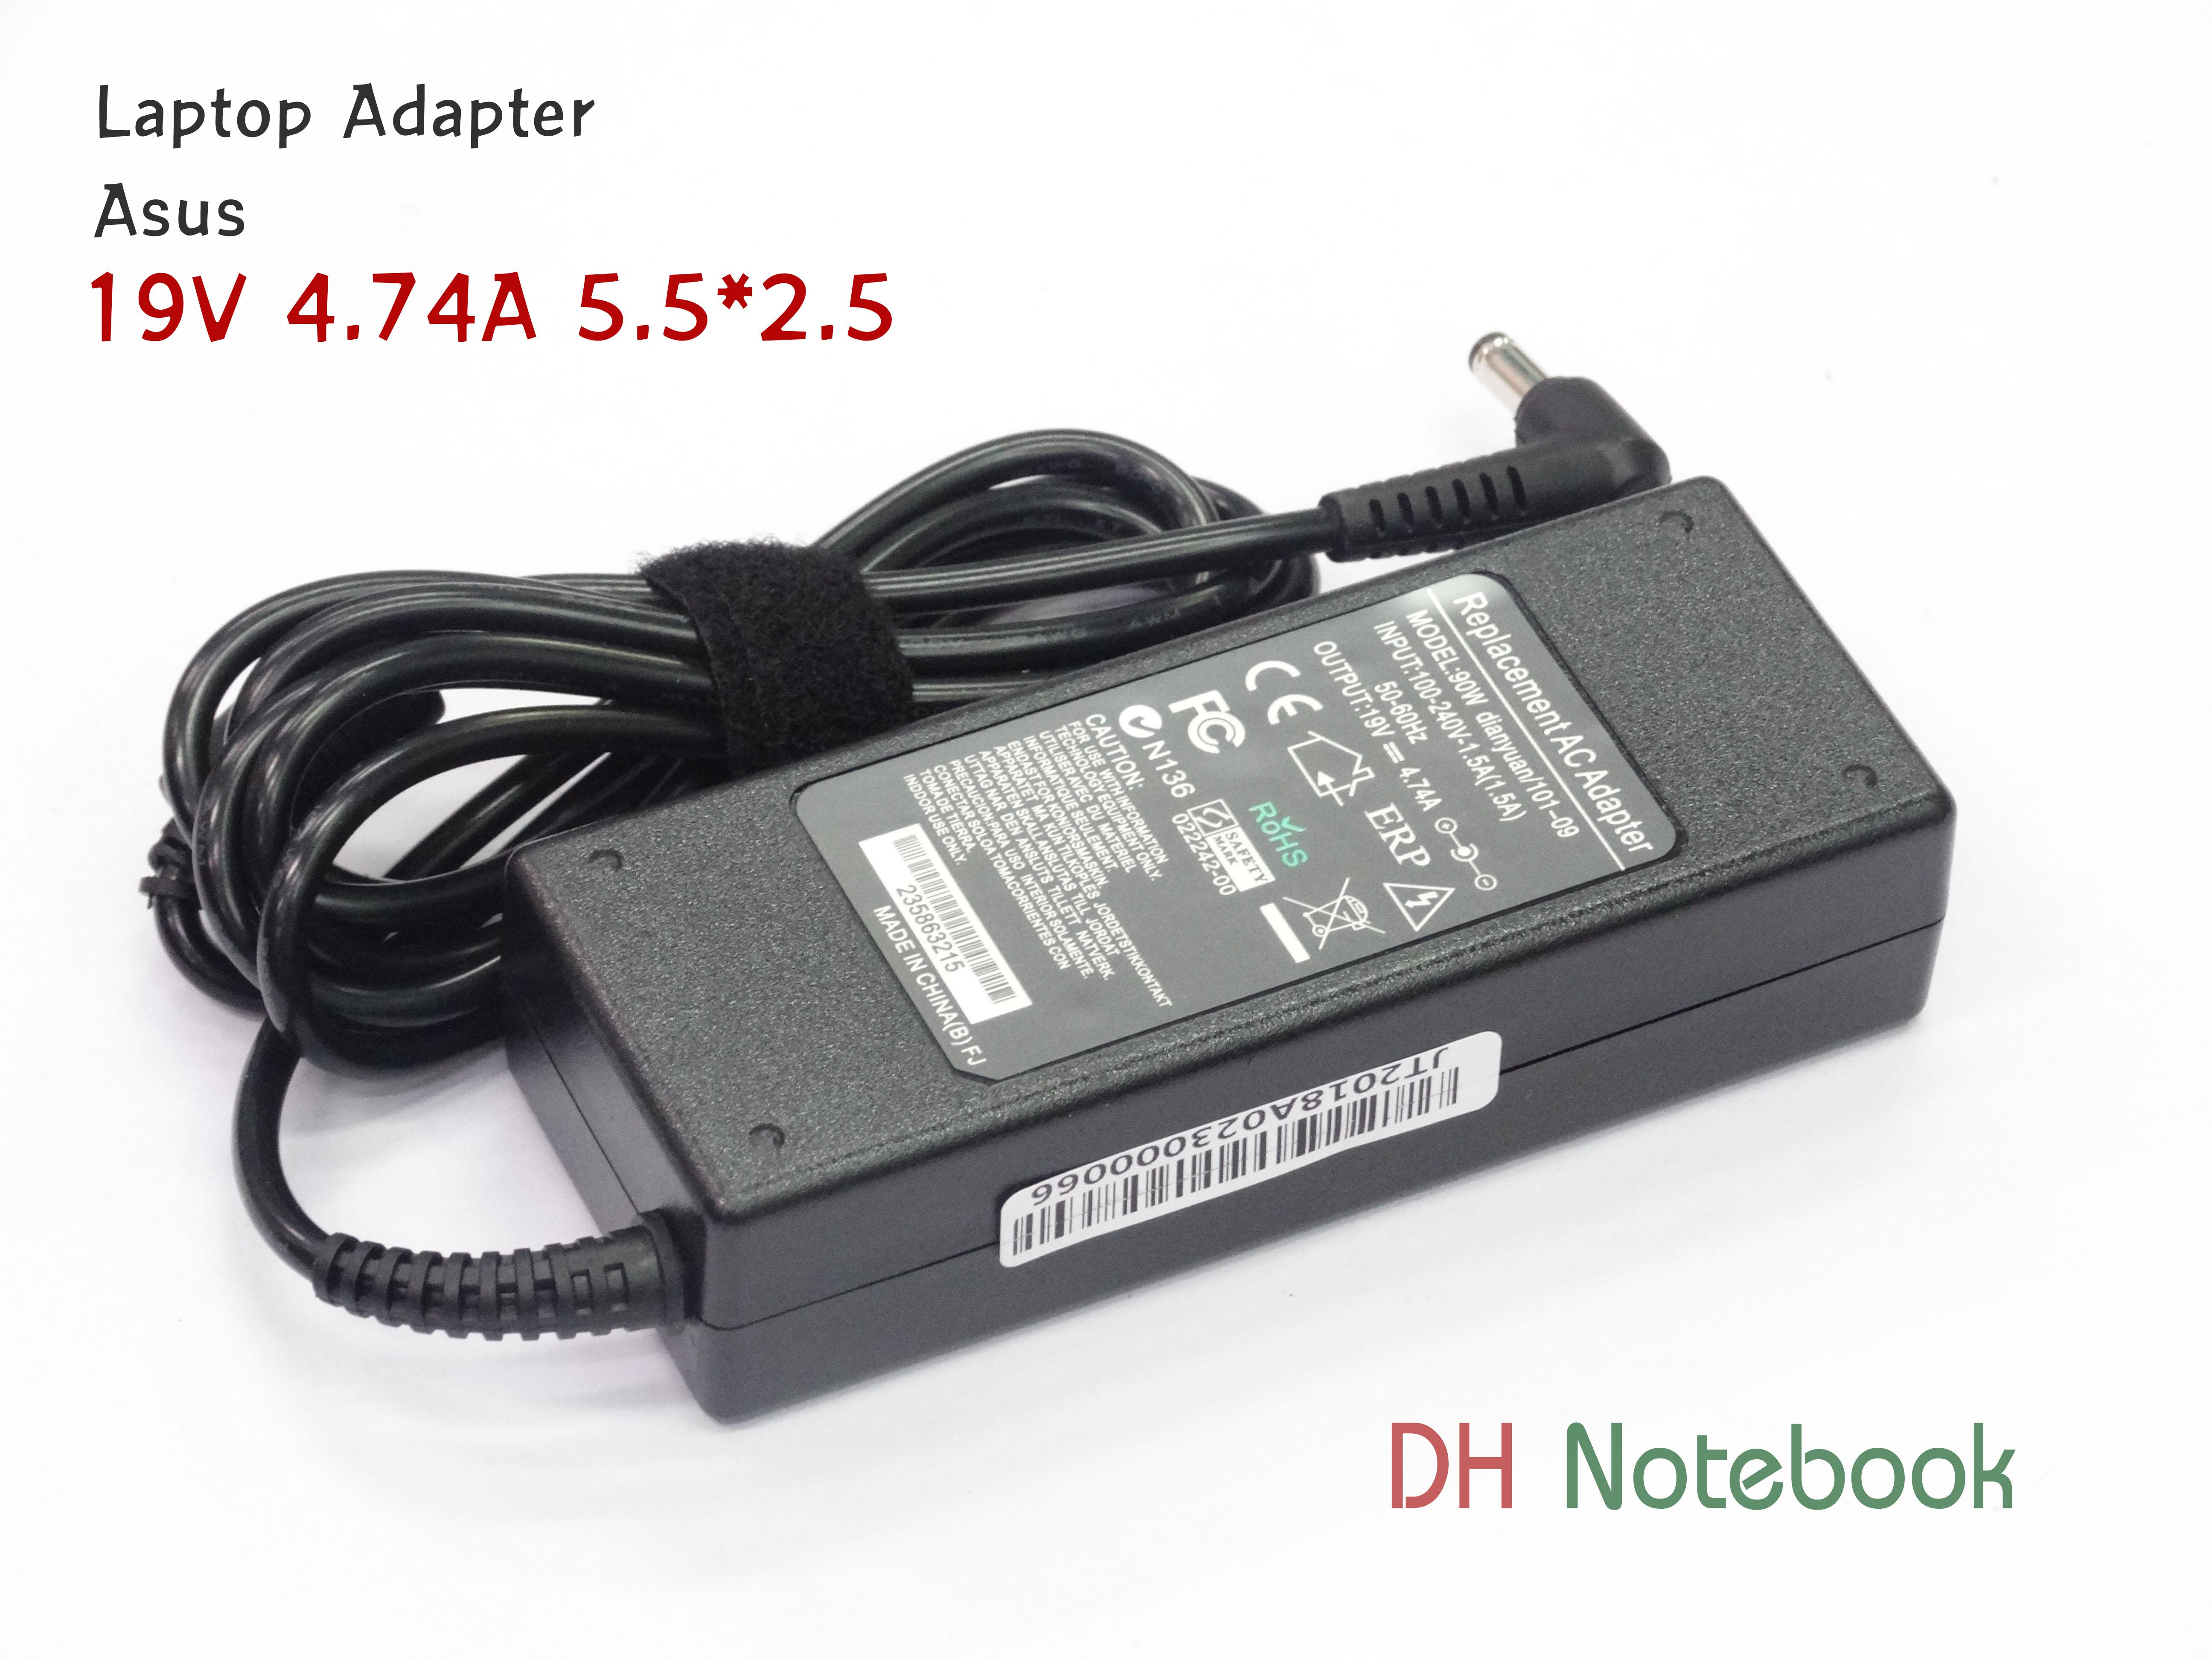 Adapter ASUS 19V 4.74A 5.5*2.5